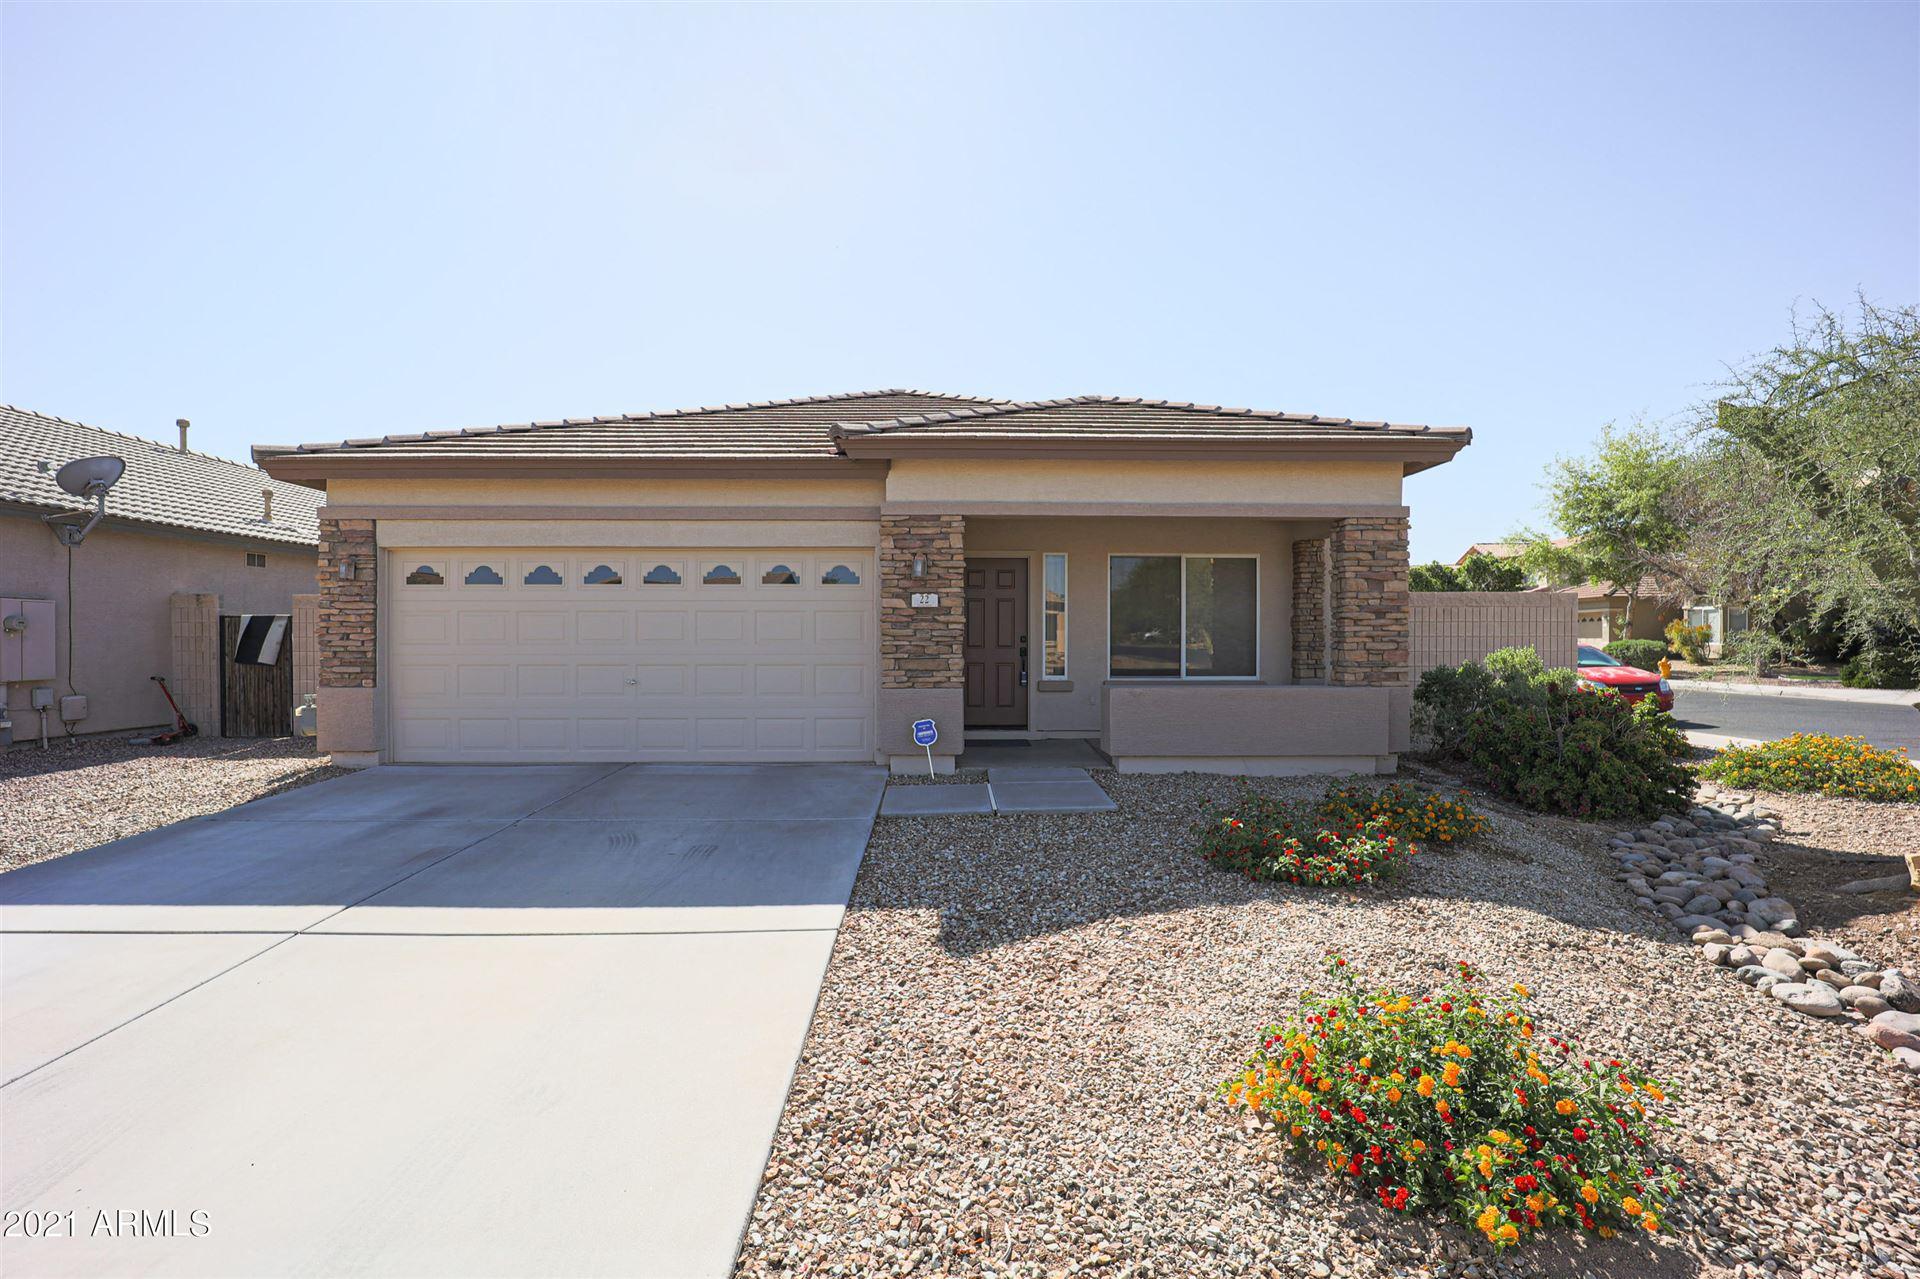 Photo of 22 N 124TH Avenue, Avondale, AZ 85323 (MLS # 6224370)